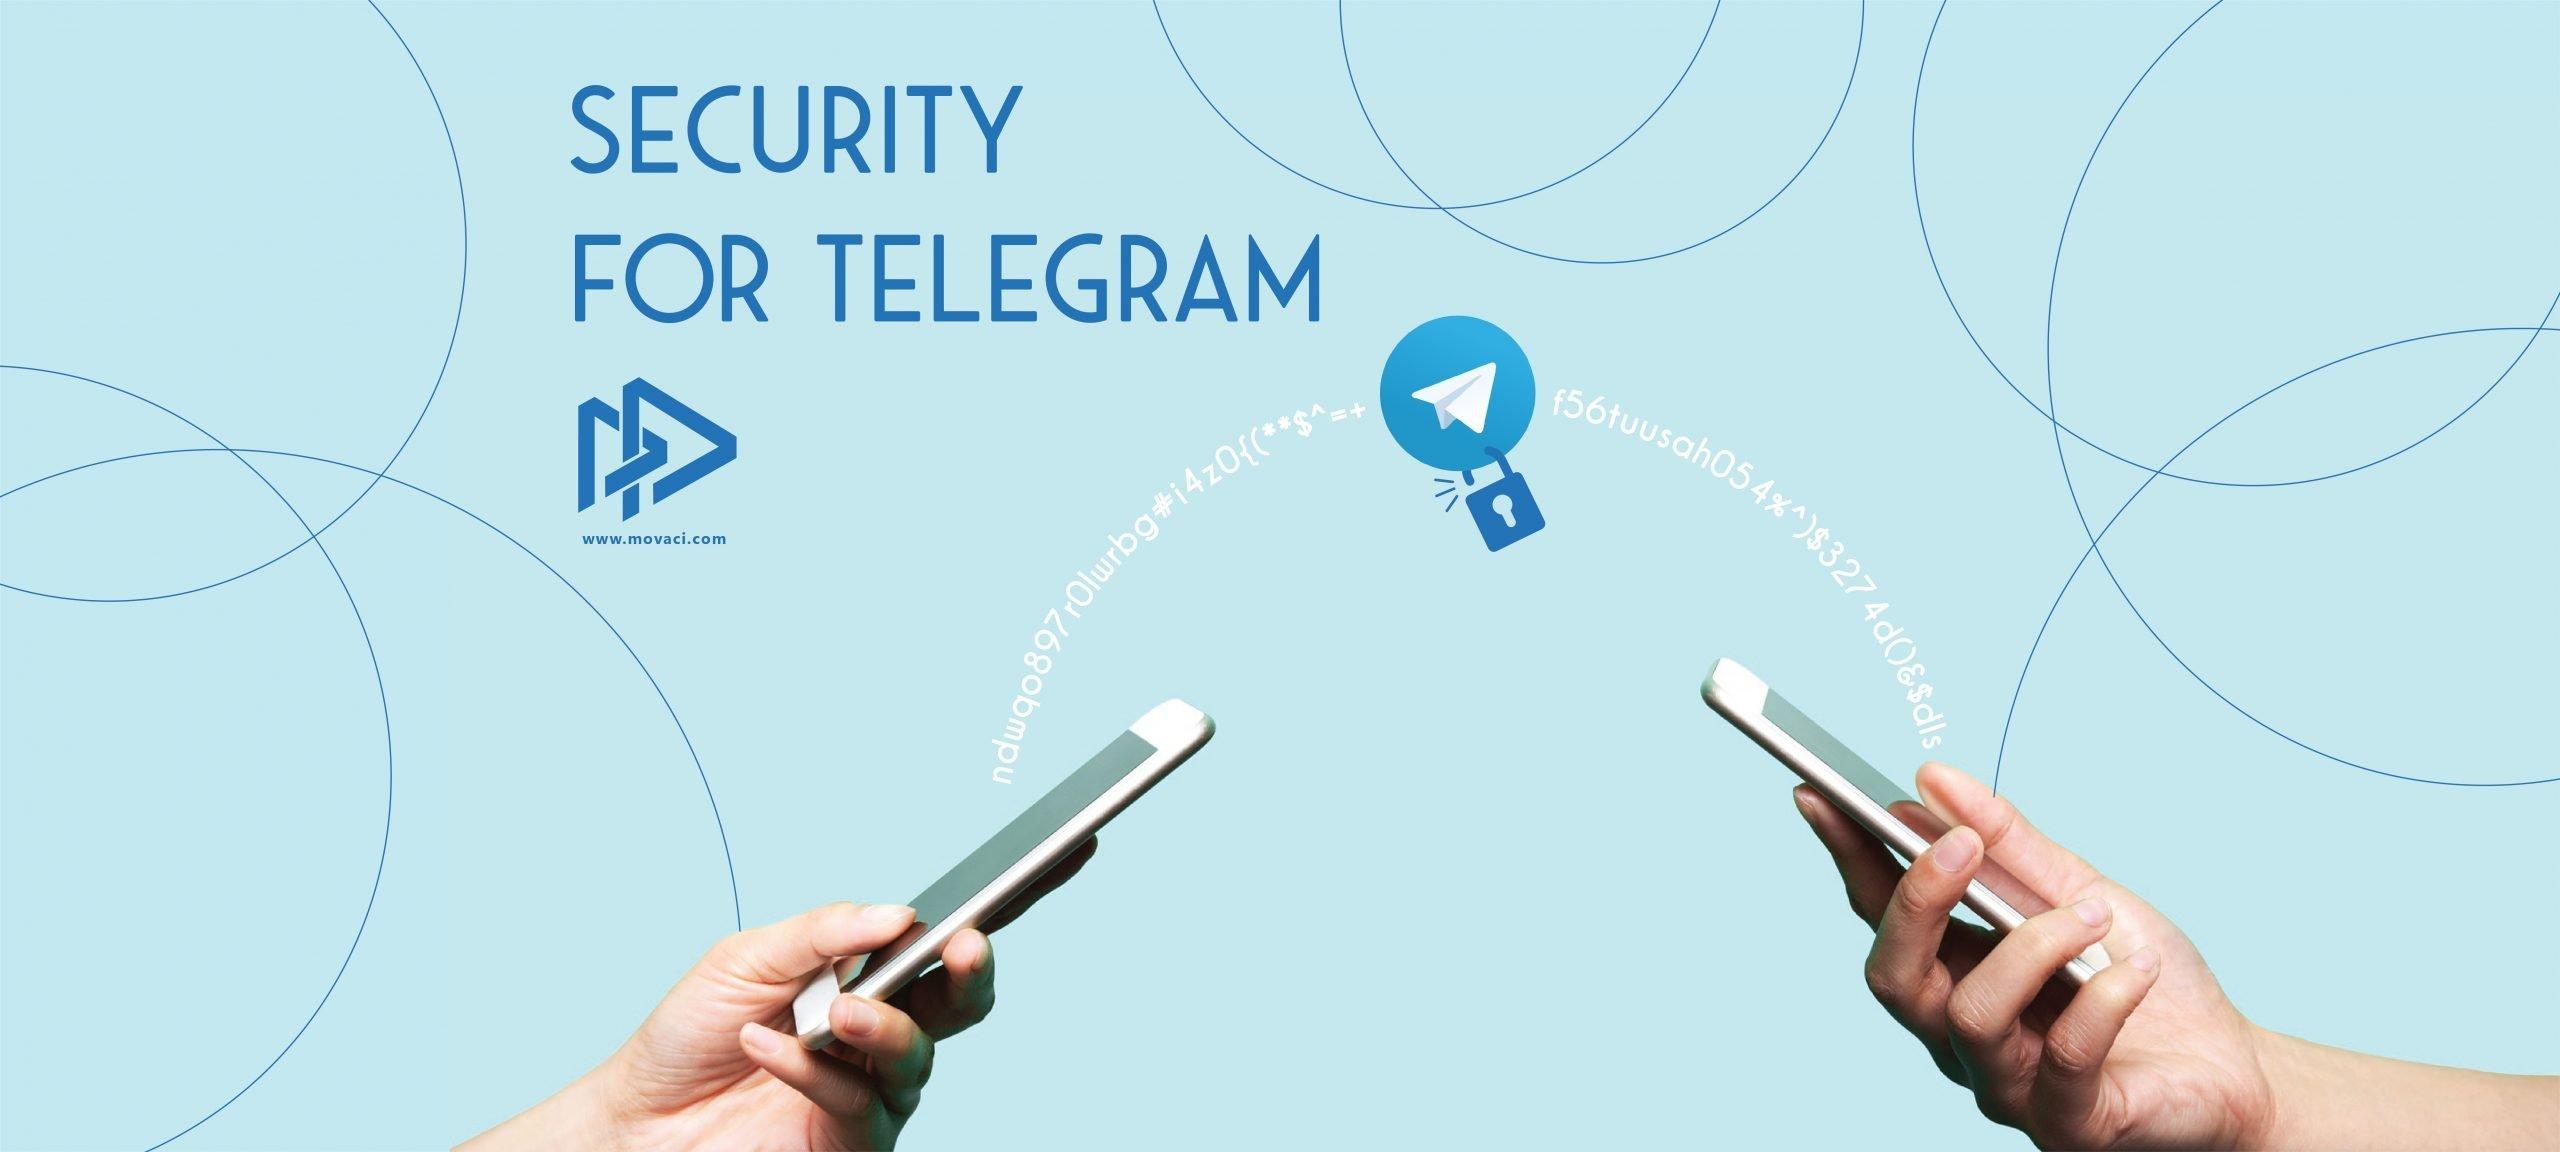 Security for Telegram 1